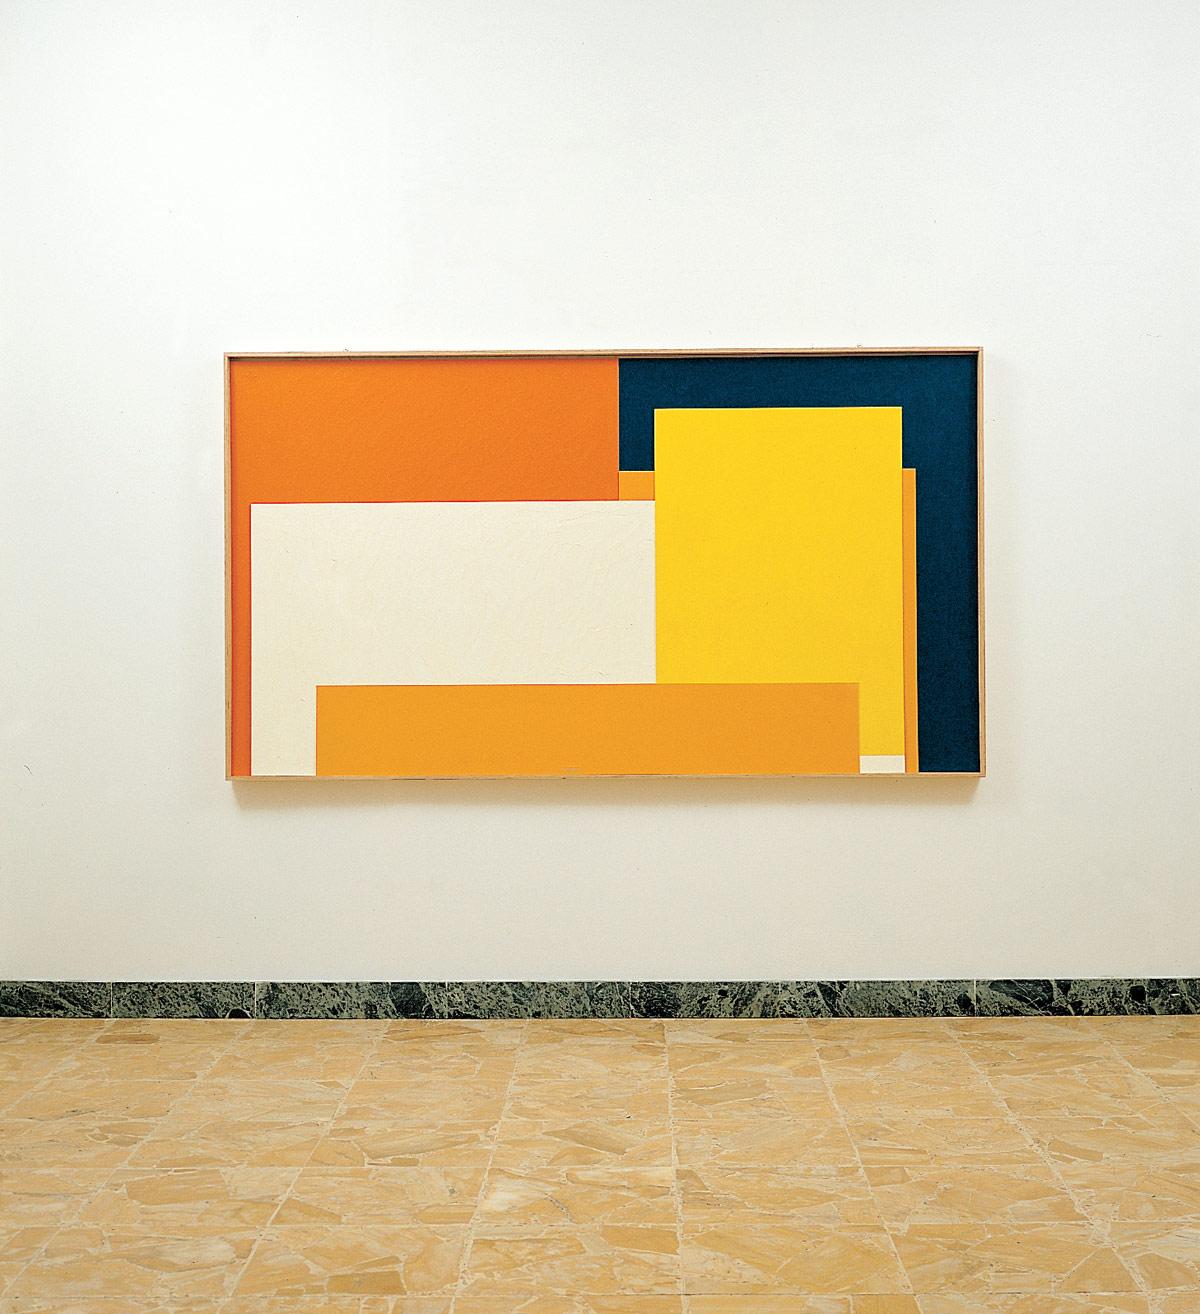 Antonio Catelani - Antonio-Catelani-Madreforma 1998 Galleria Continua San Gimignano